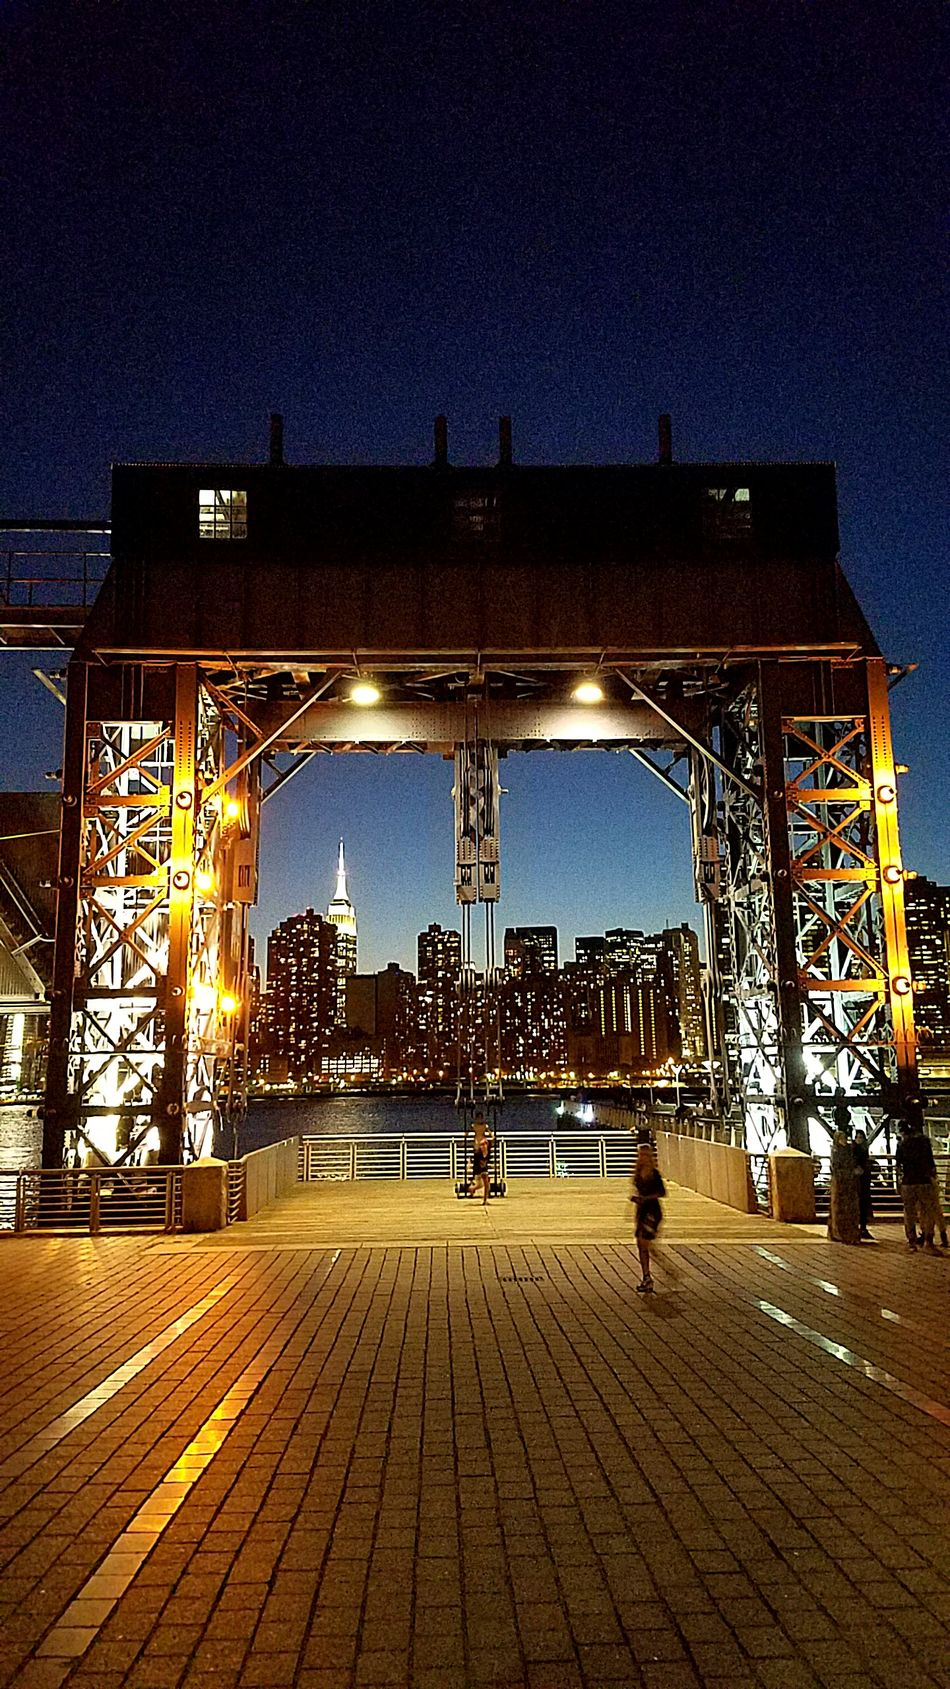 NYC NYC LIFE ♥ NYC Skyline Nycarchitecture NYC Photography NYCNights